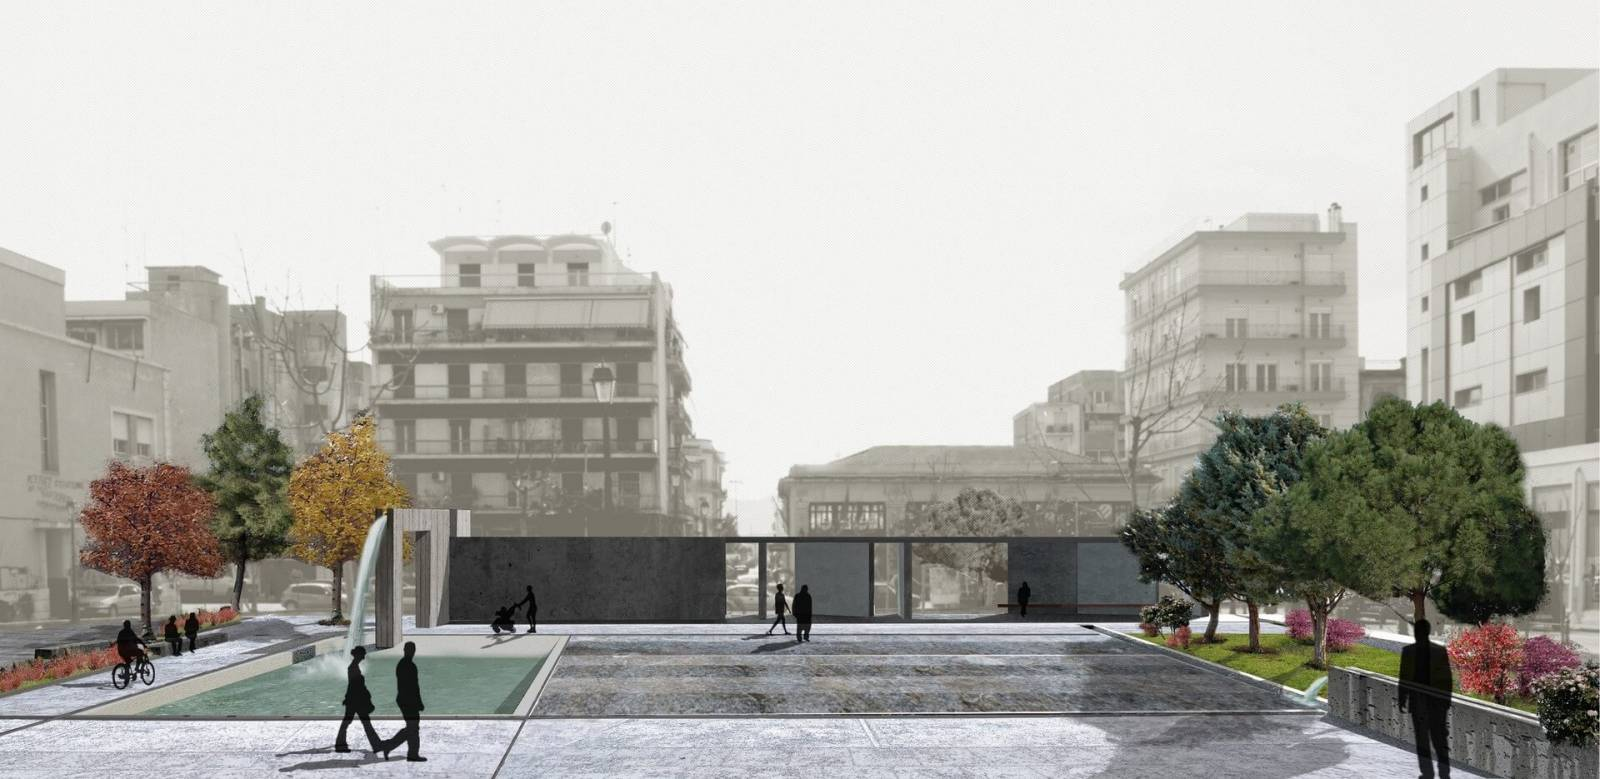 Panepistimiou Square - 3